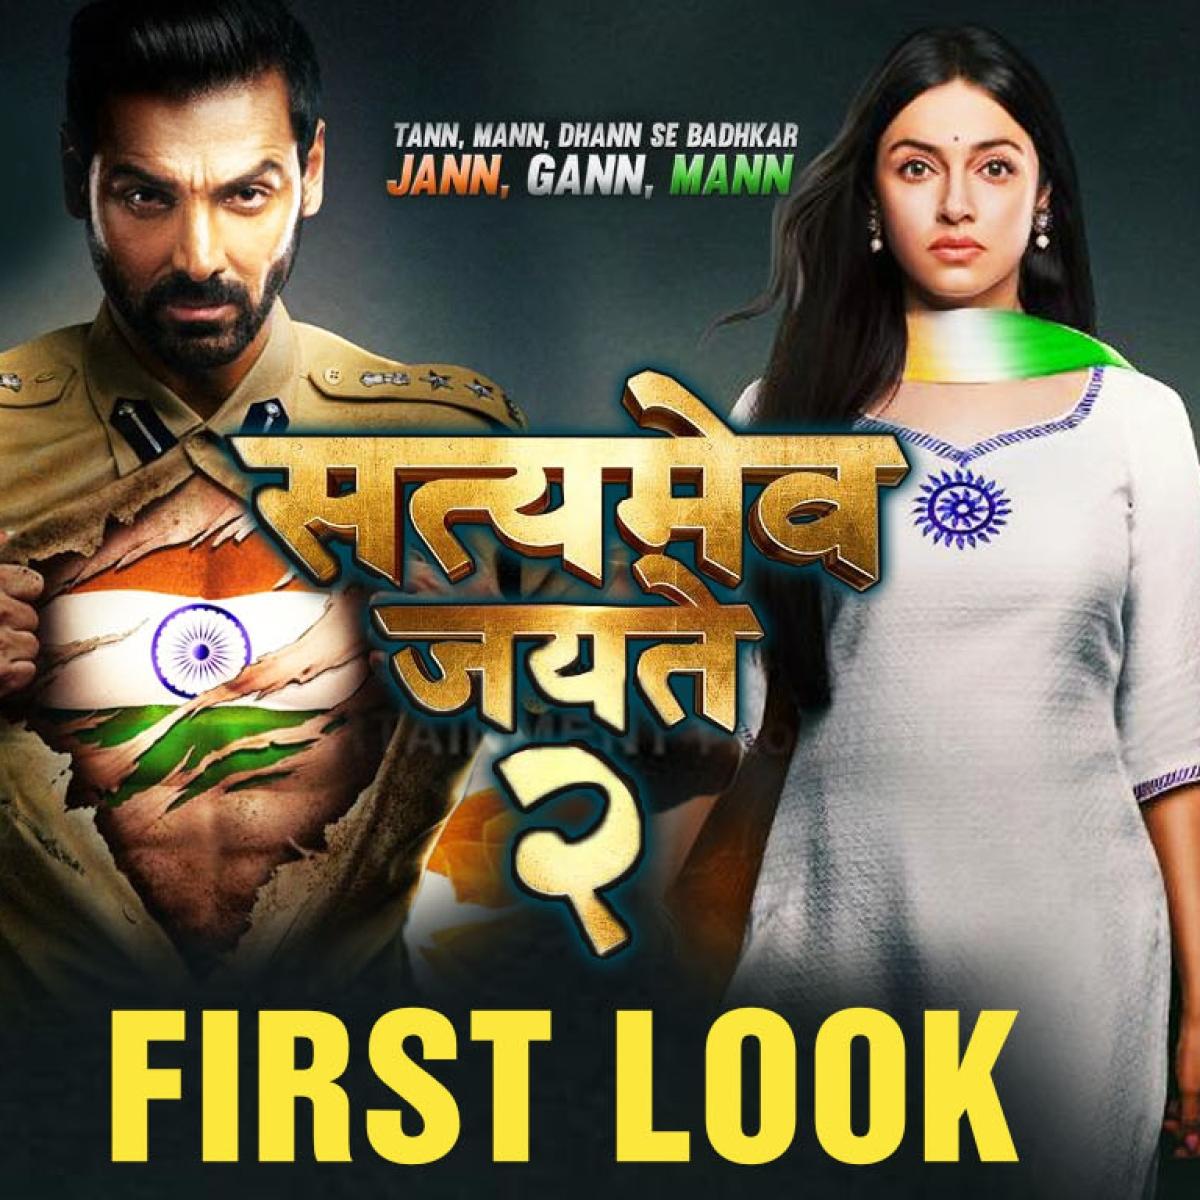 Satyameva Jayate 2' First Look Poster Out: John Abraham Promises A Bigger Sequel